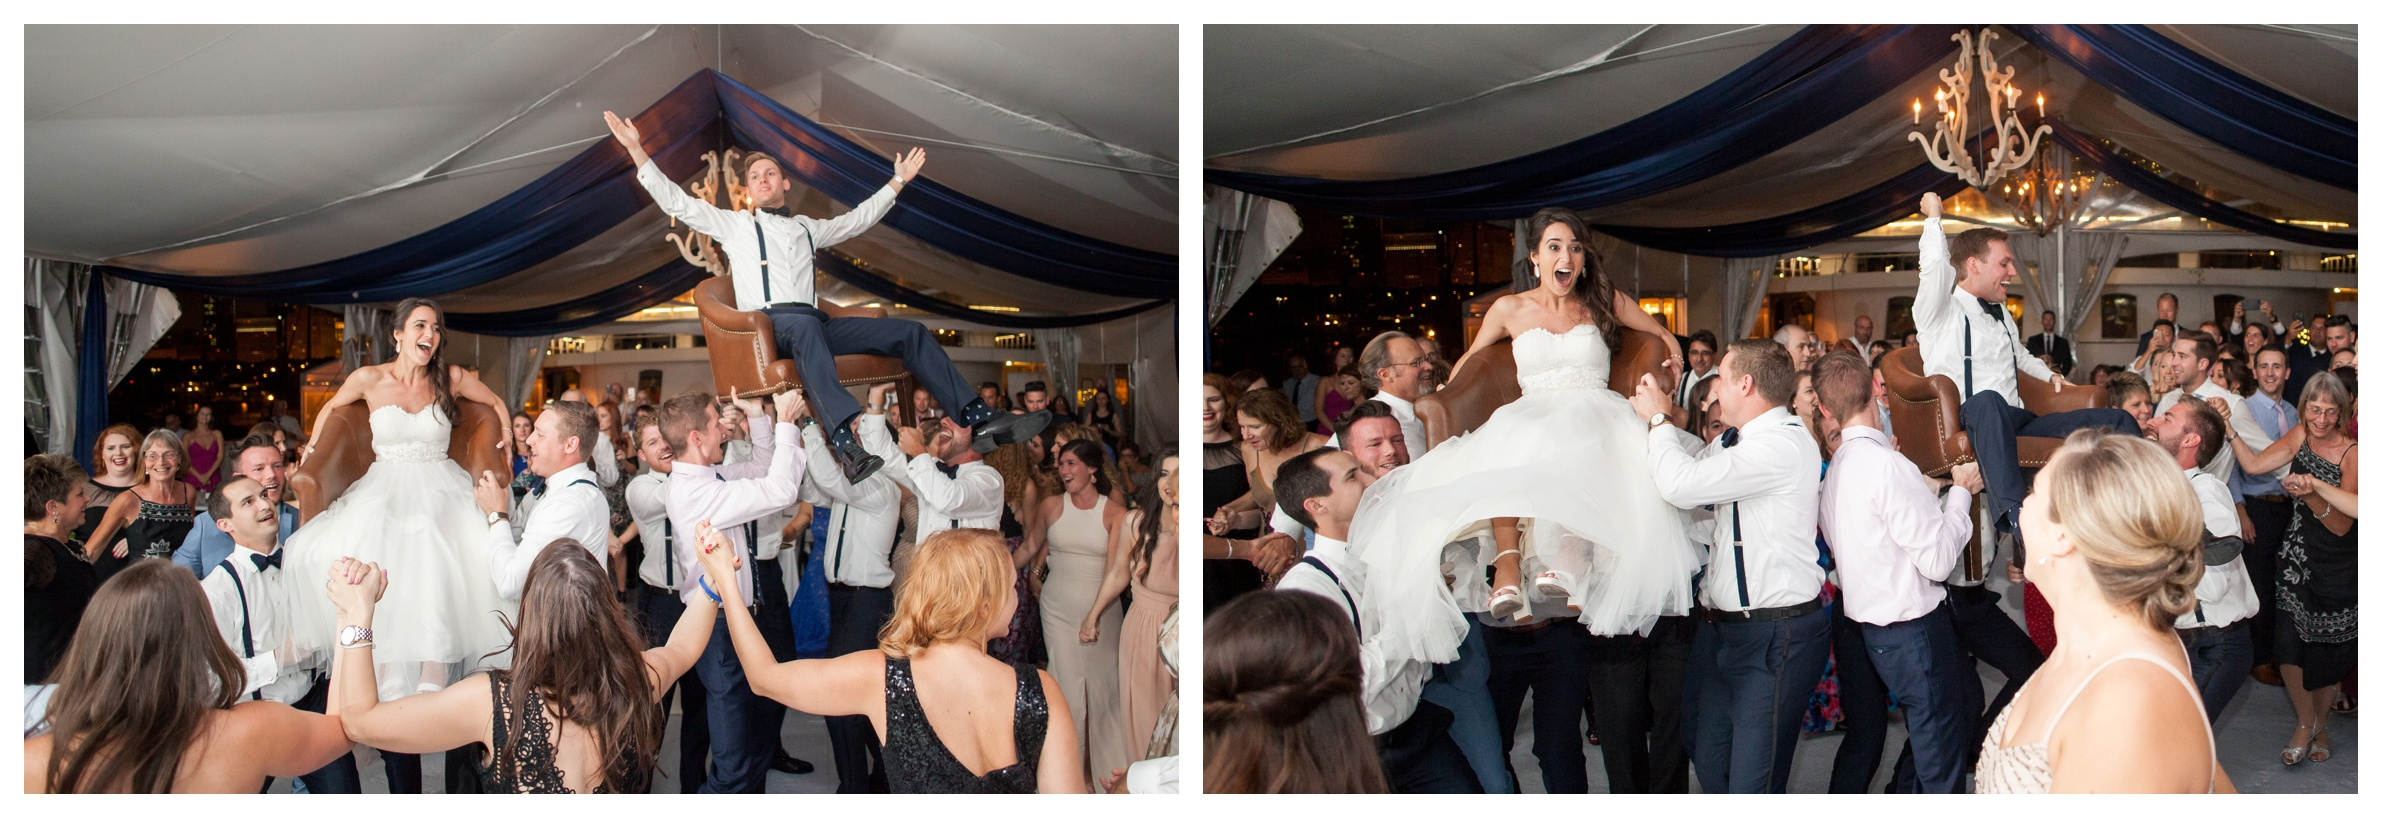 columbia-yacht-club-chicago-wedding_0051.jpg